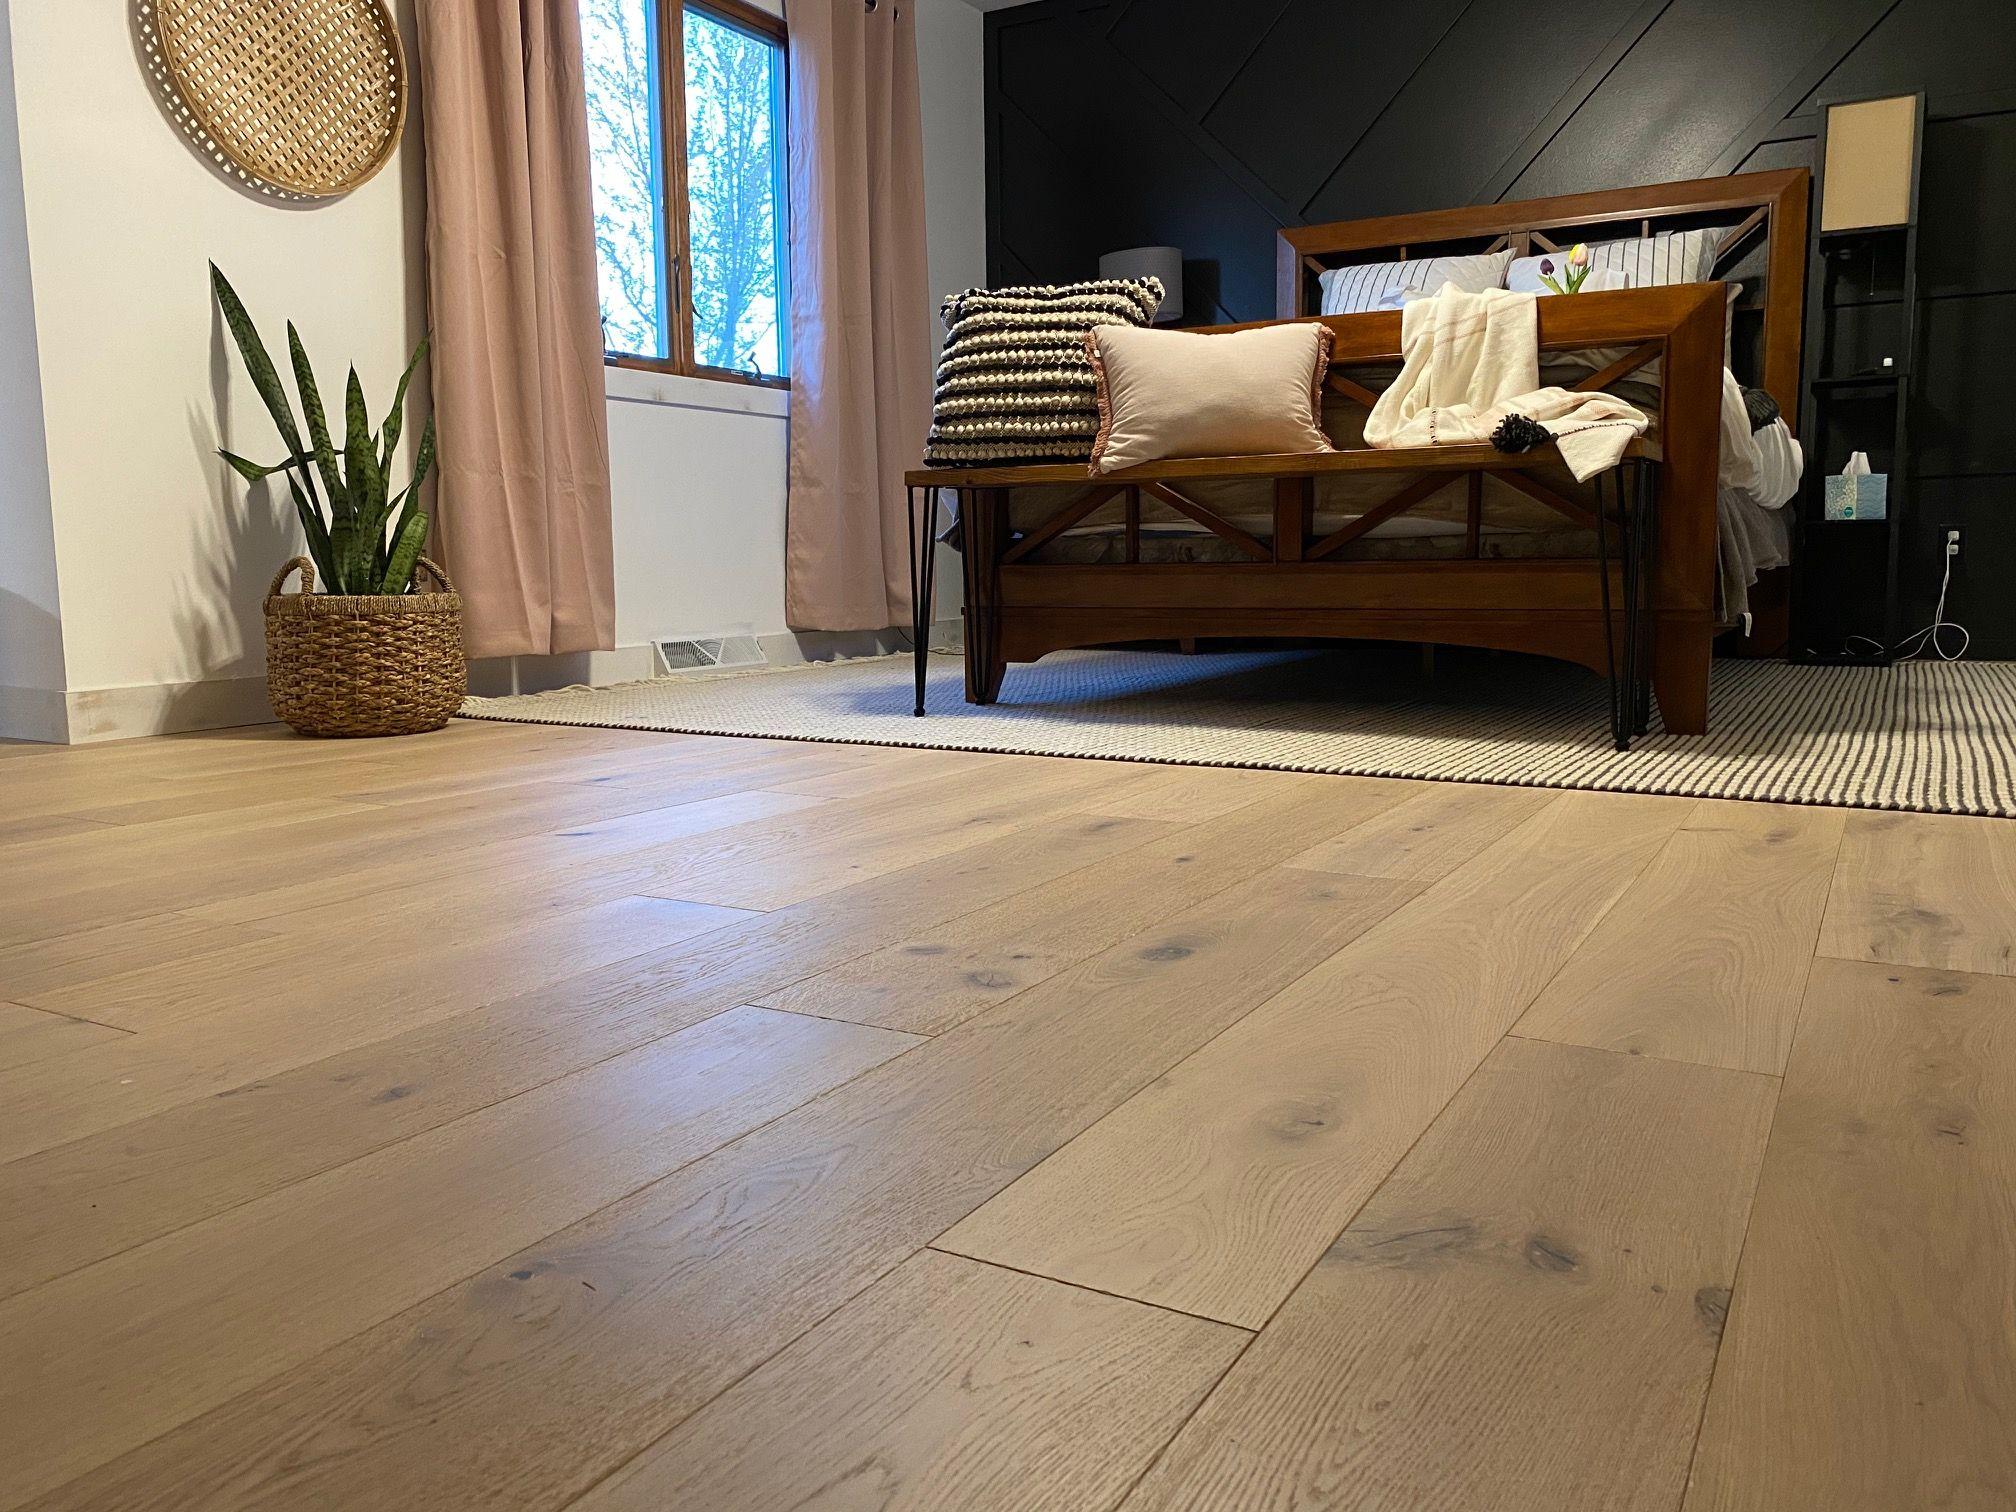 Laguna Oak Hardwood Hallmark Floors In 2020 Oak Hardwood Inexpensive Home Decor Rustic Country Homes